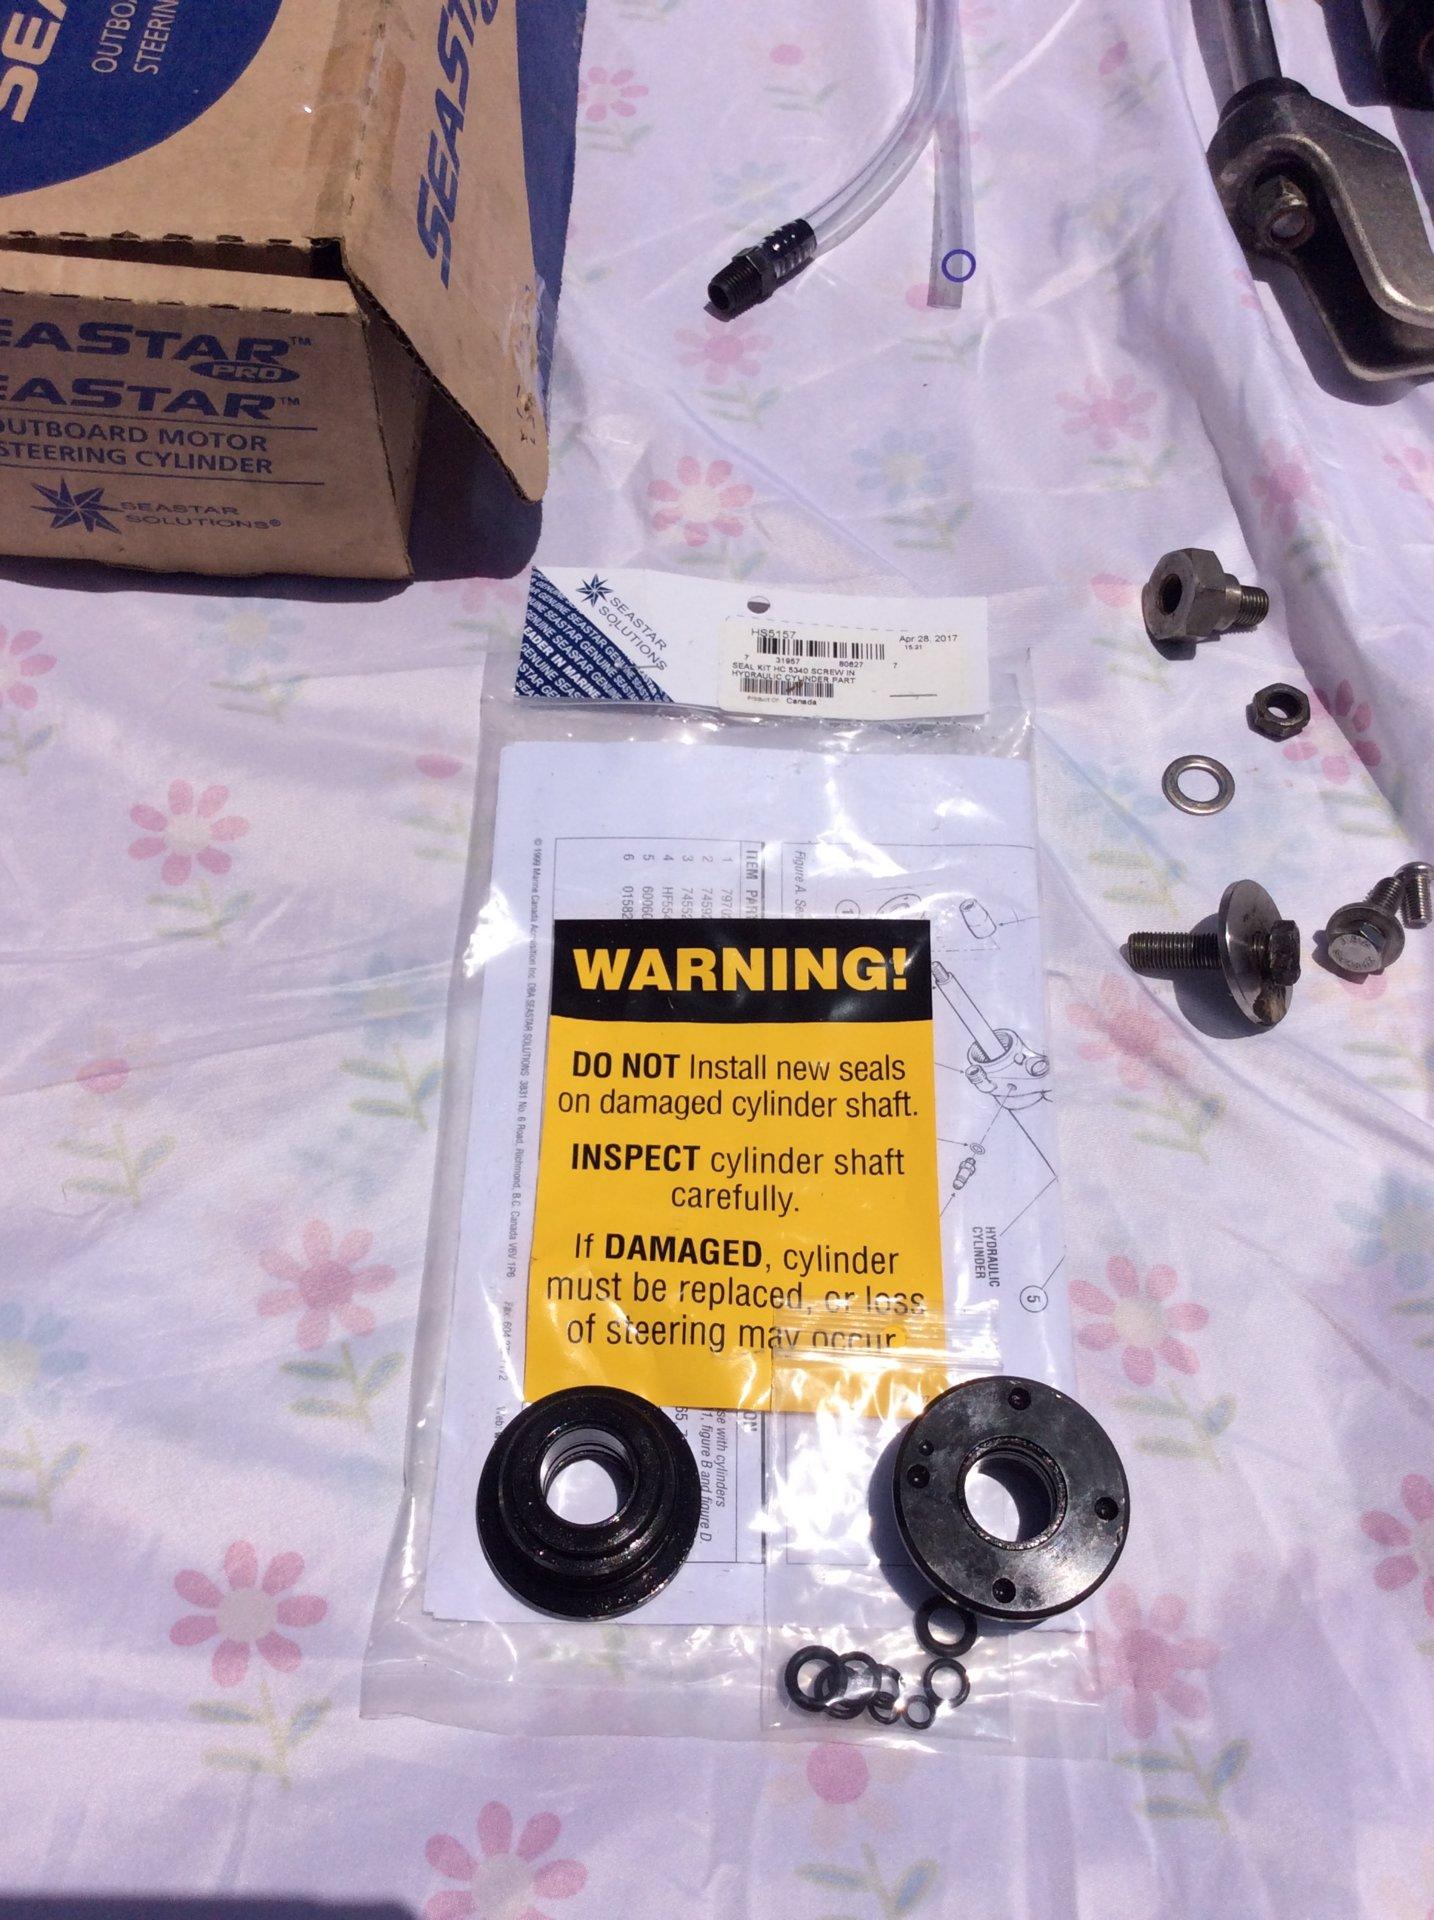 For Sale - SeaStar Hc5358 power steering cylinder system